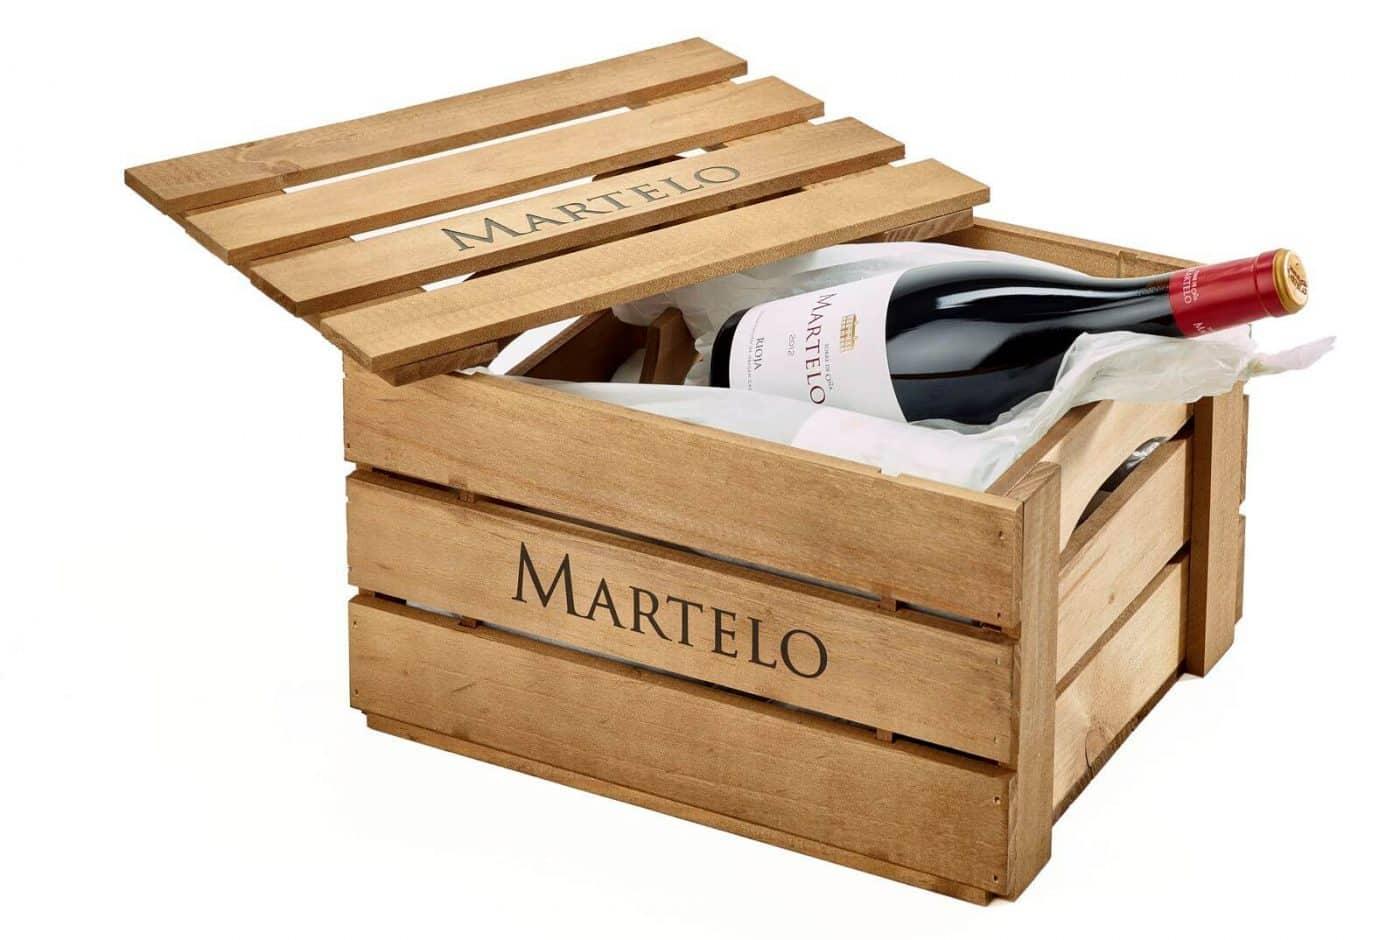 Martelo, un soplo de aire fresco en Rioja Alavesa 3